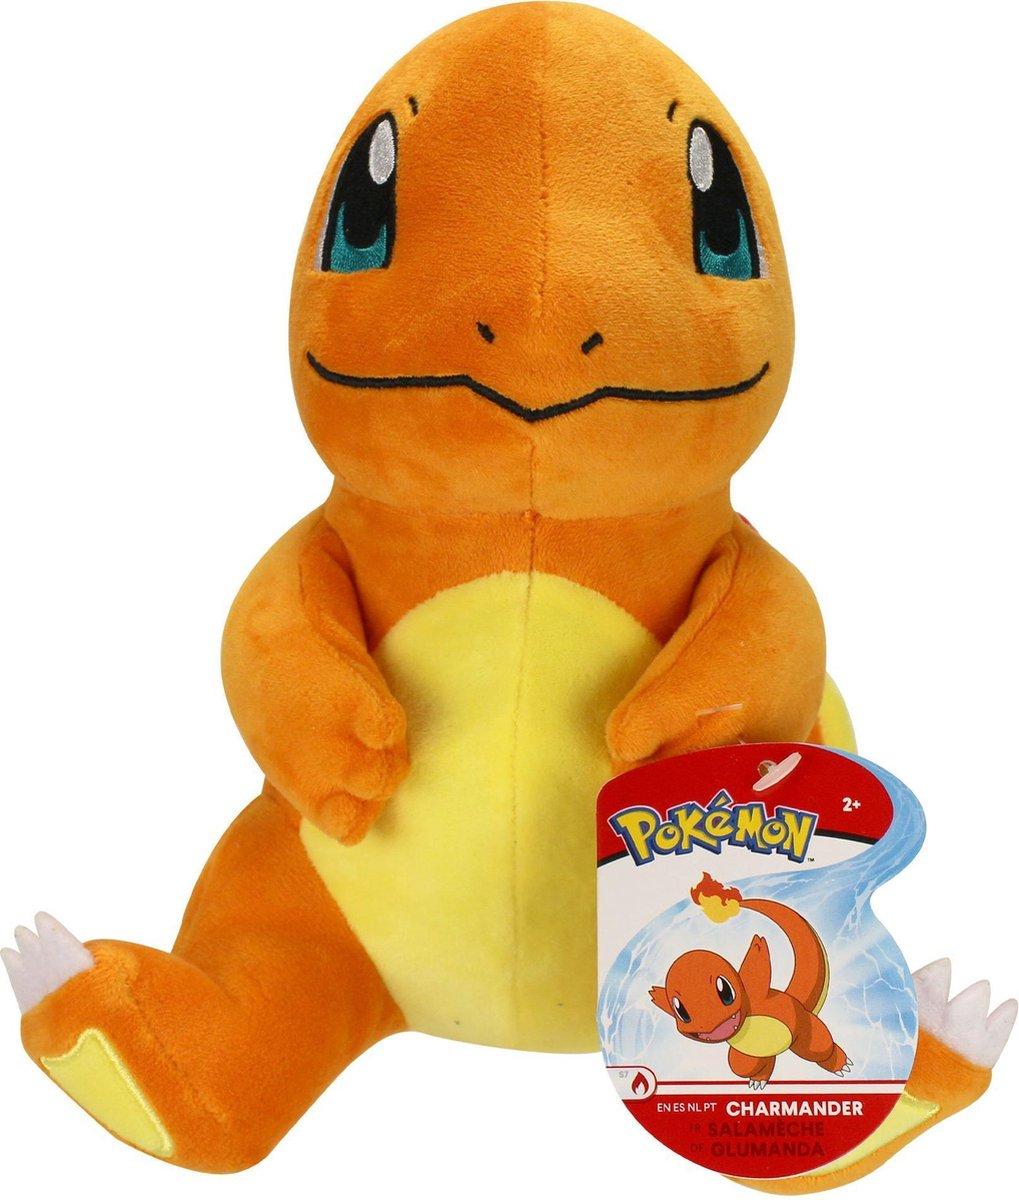 Pokemon Charmander Pluche Knuffel 21 cm | Friends Charmander - Charizard - Dragon - Draak - Dragonite